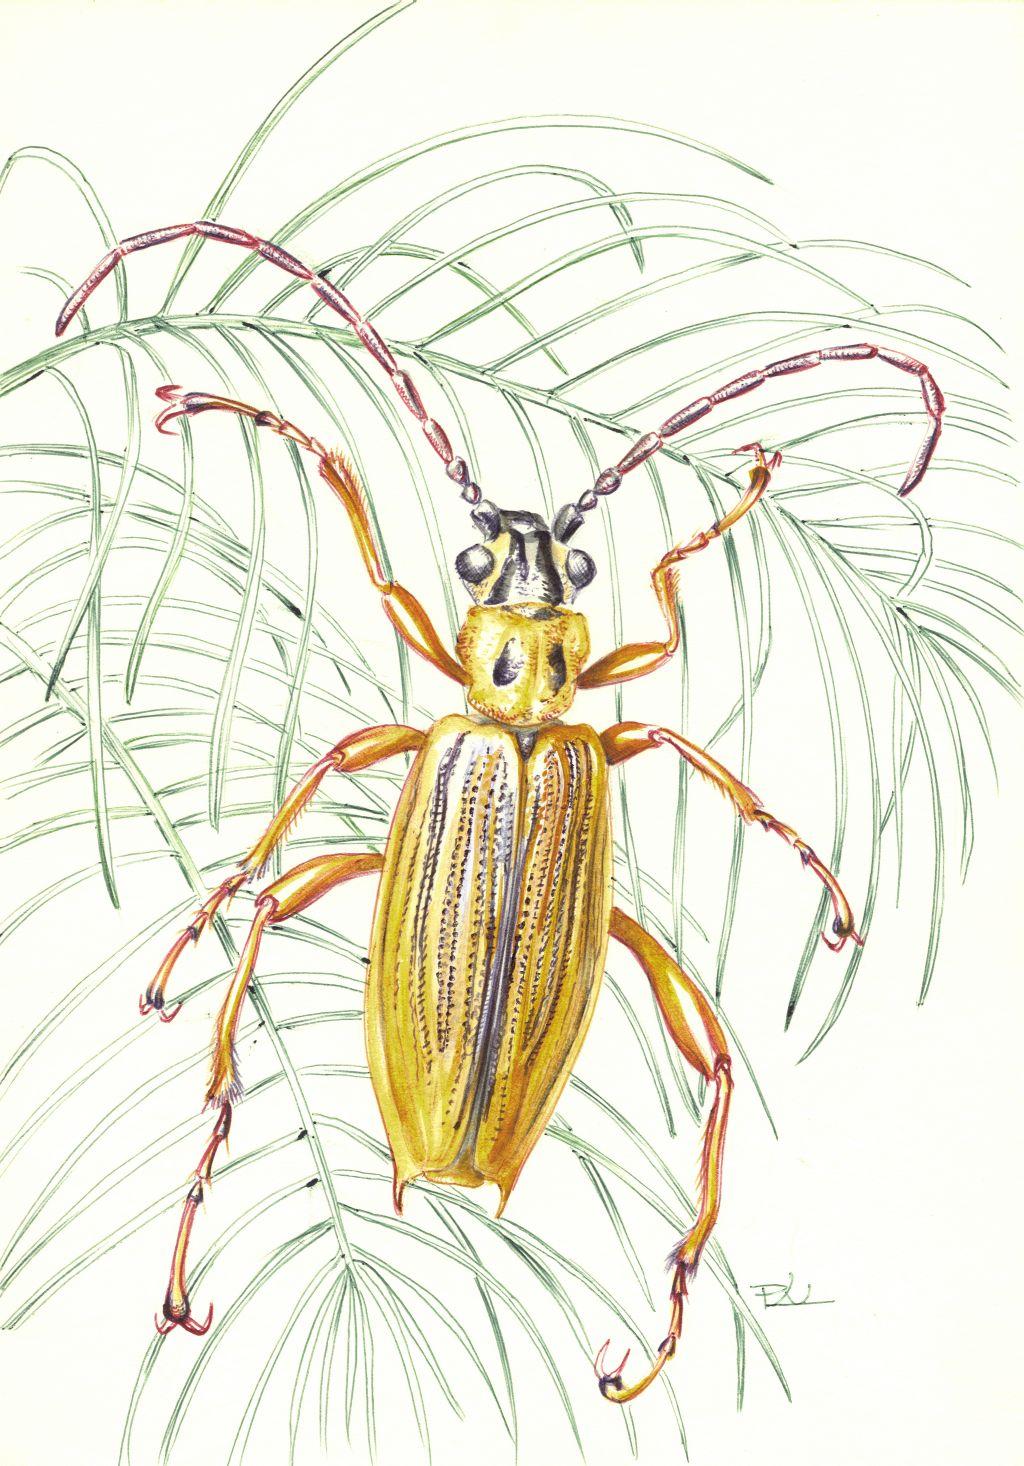 Balatoni hínárbogár (Macroplea mutica)